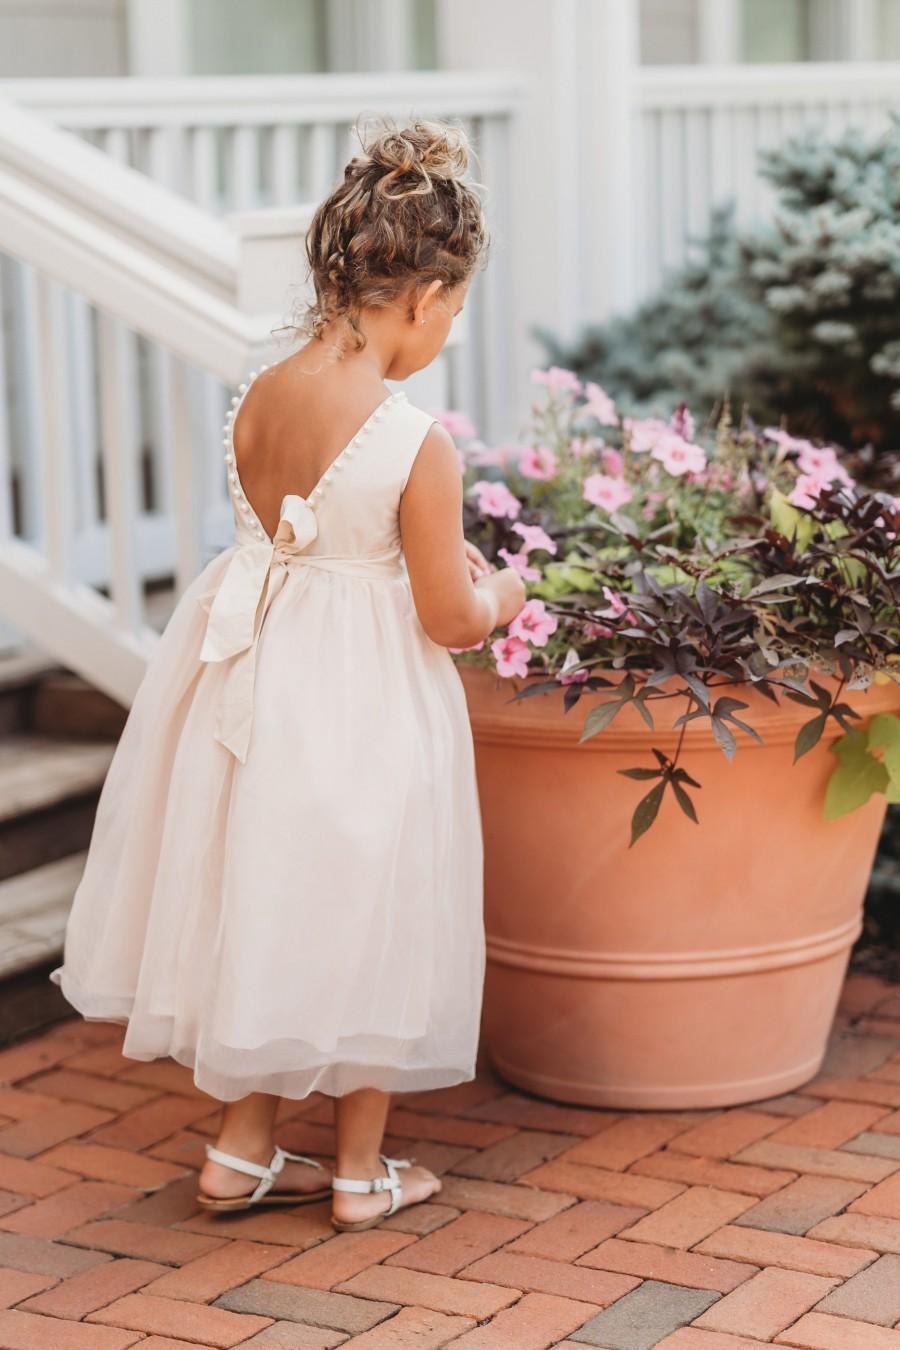 Свадьба - Elegant flower girl dress,ivory flower girl dress,ivory tulle dress,girls dress,first communion dress,baptism dress,blessing dress,vintage